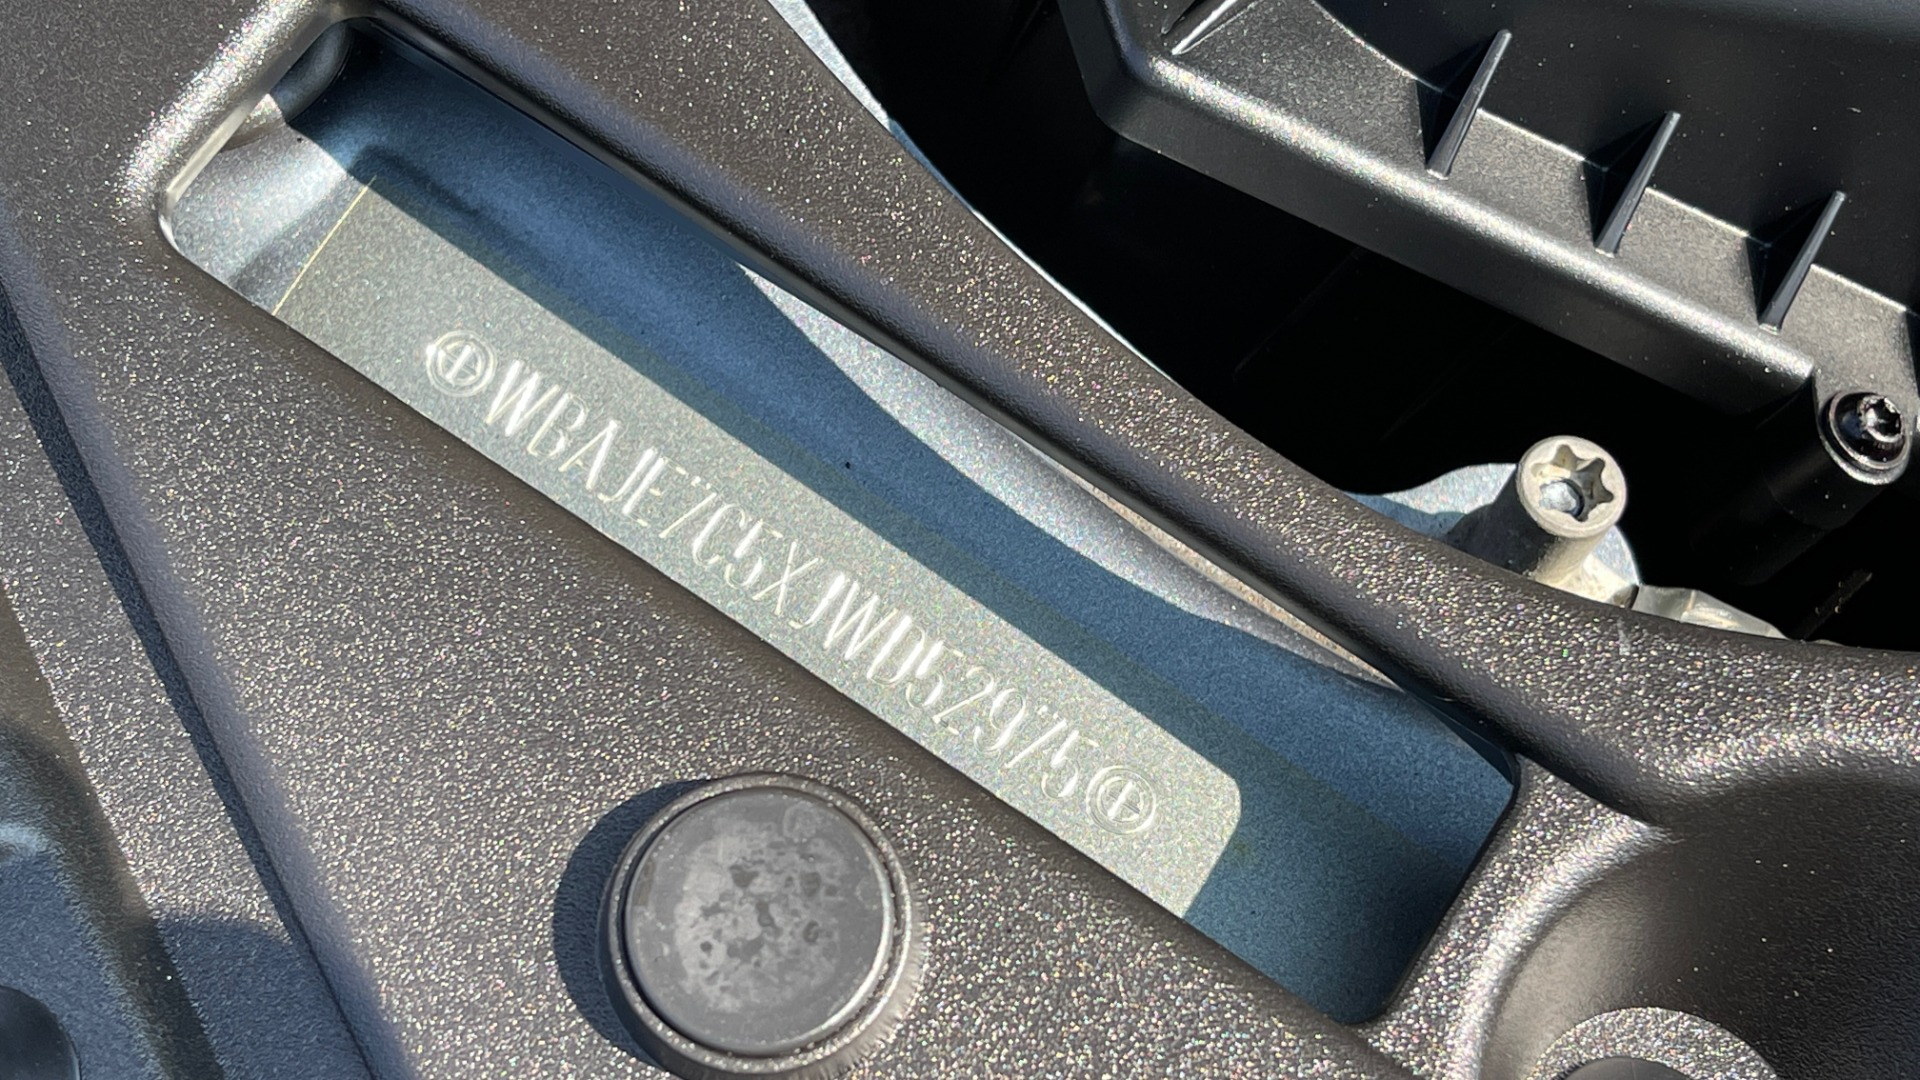 Used 2018 BMW 5 SERIES 540I XDRIVE M-SPORT / DRVR ASST / PDC / APPLE / HUD / H/K SND for sale $42,795 at Formula Imports in Charlotte NC 28227 9